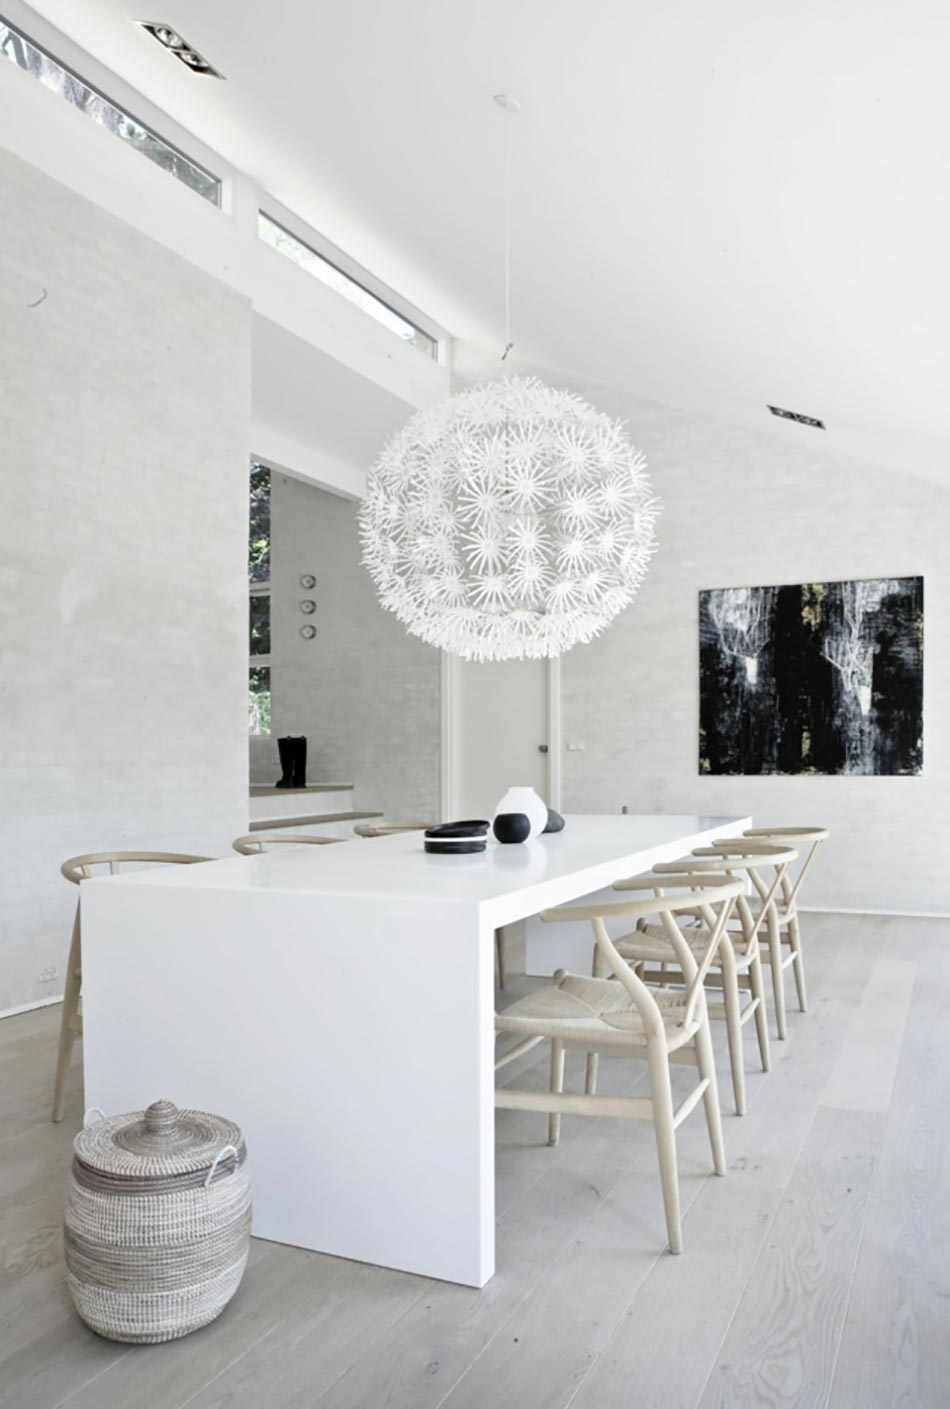 design int rieur d un blanc immacul design feria. Black Bedroom Furniture Sets. Home Design Ideas